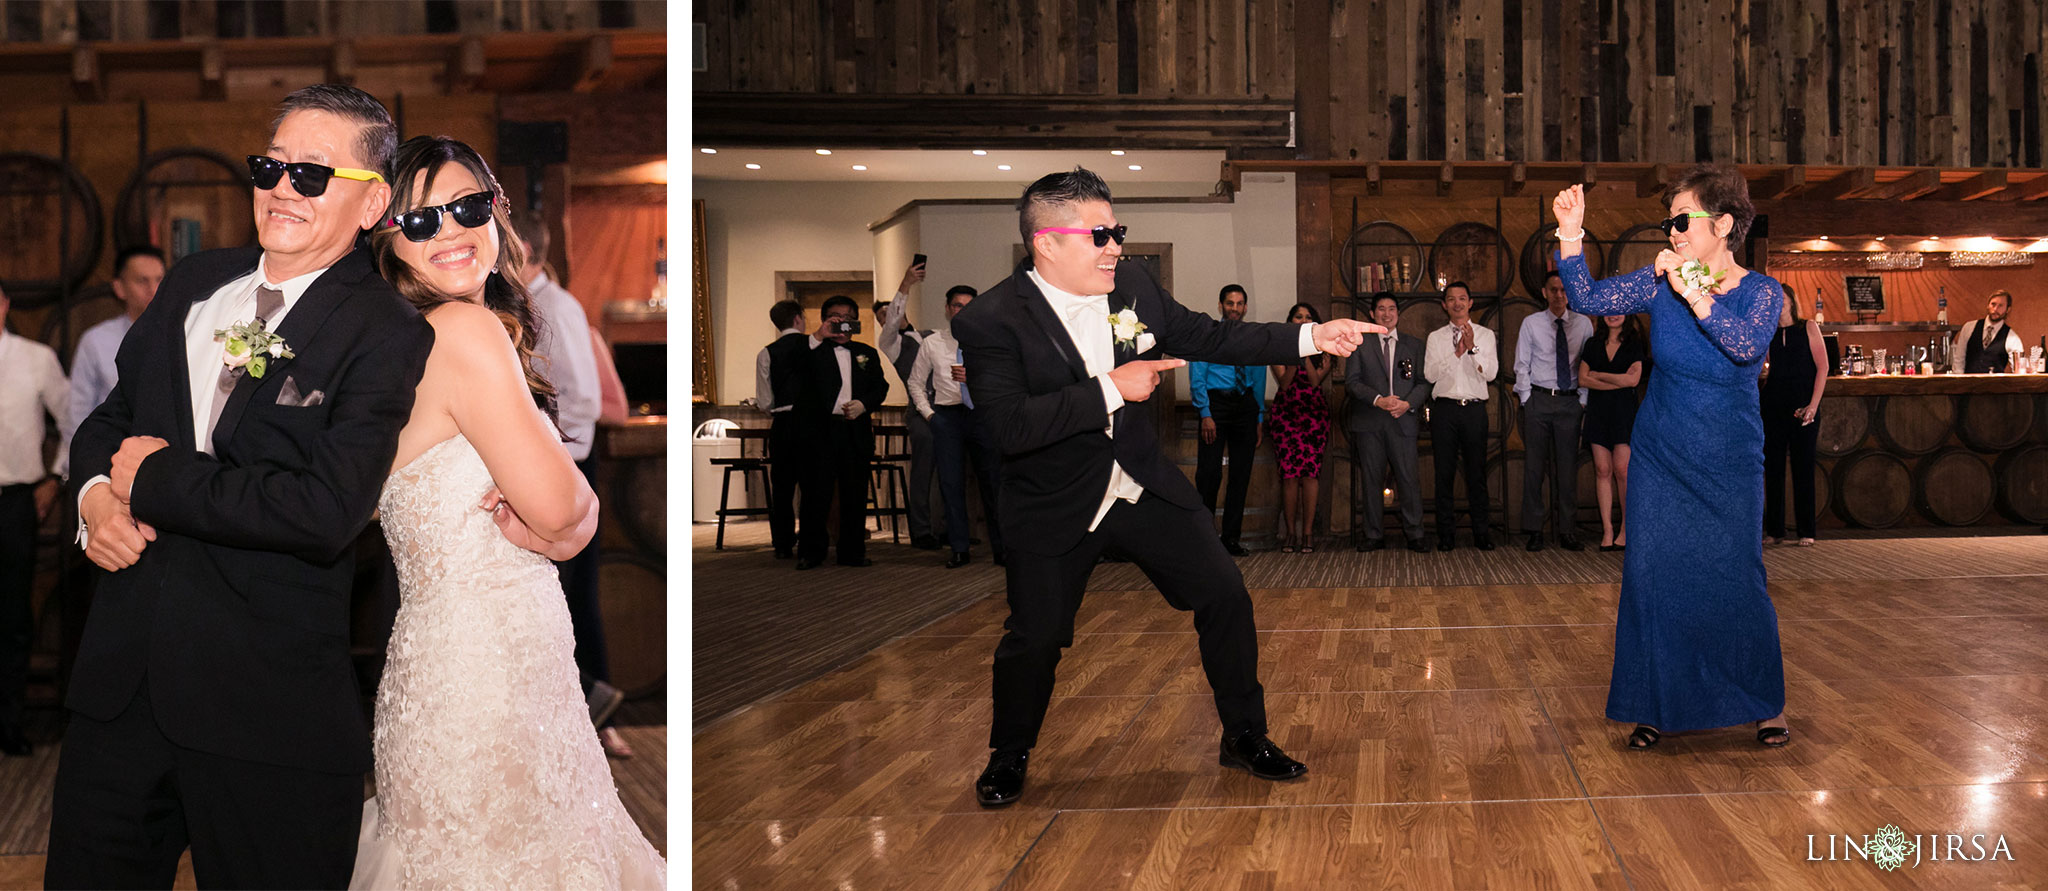 32 calamigos ranch malibu wedding reception photography